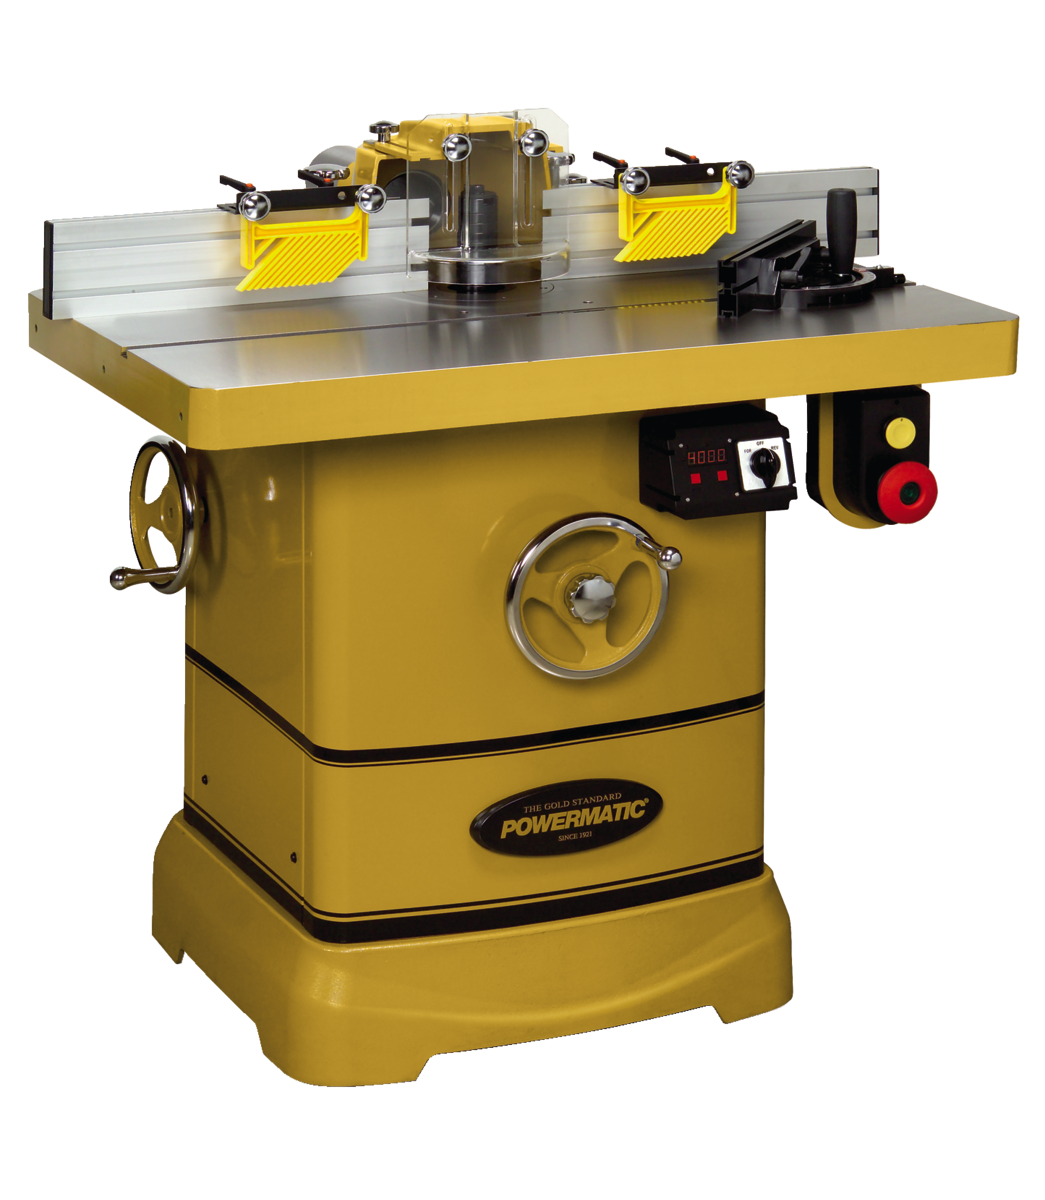 Manual: PM2700 Shaper, 3HP 1PH 230V